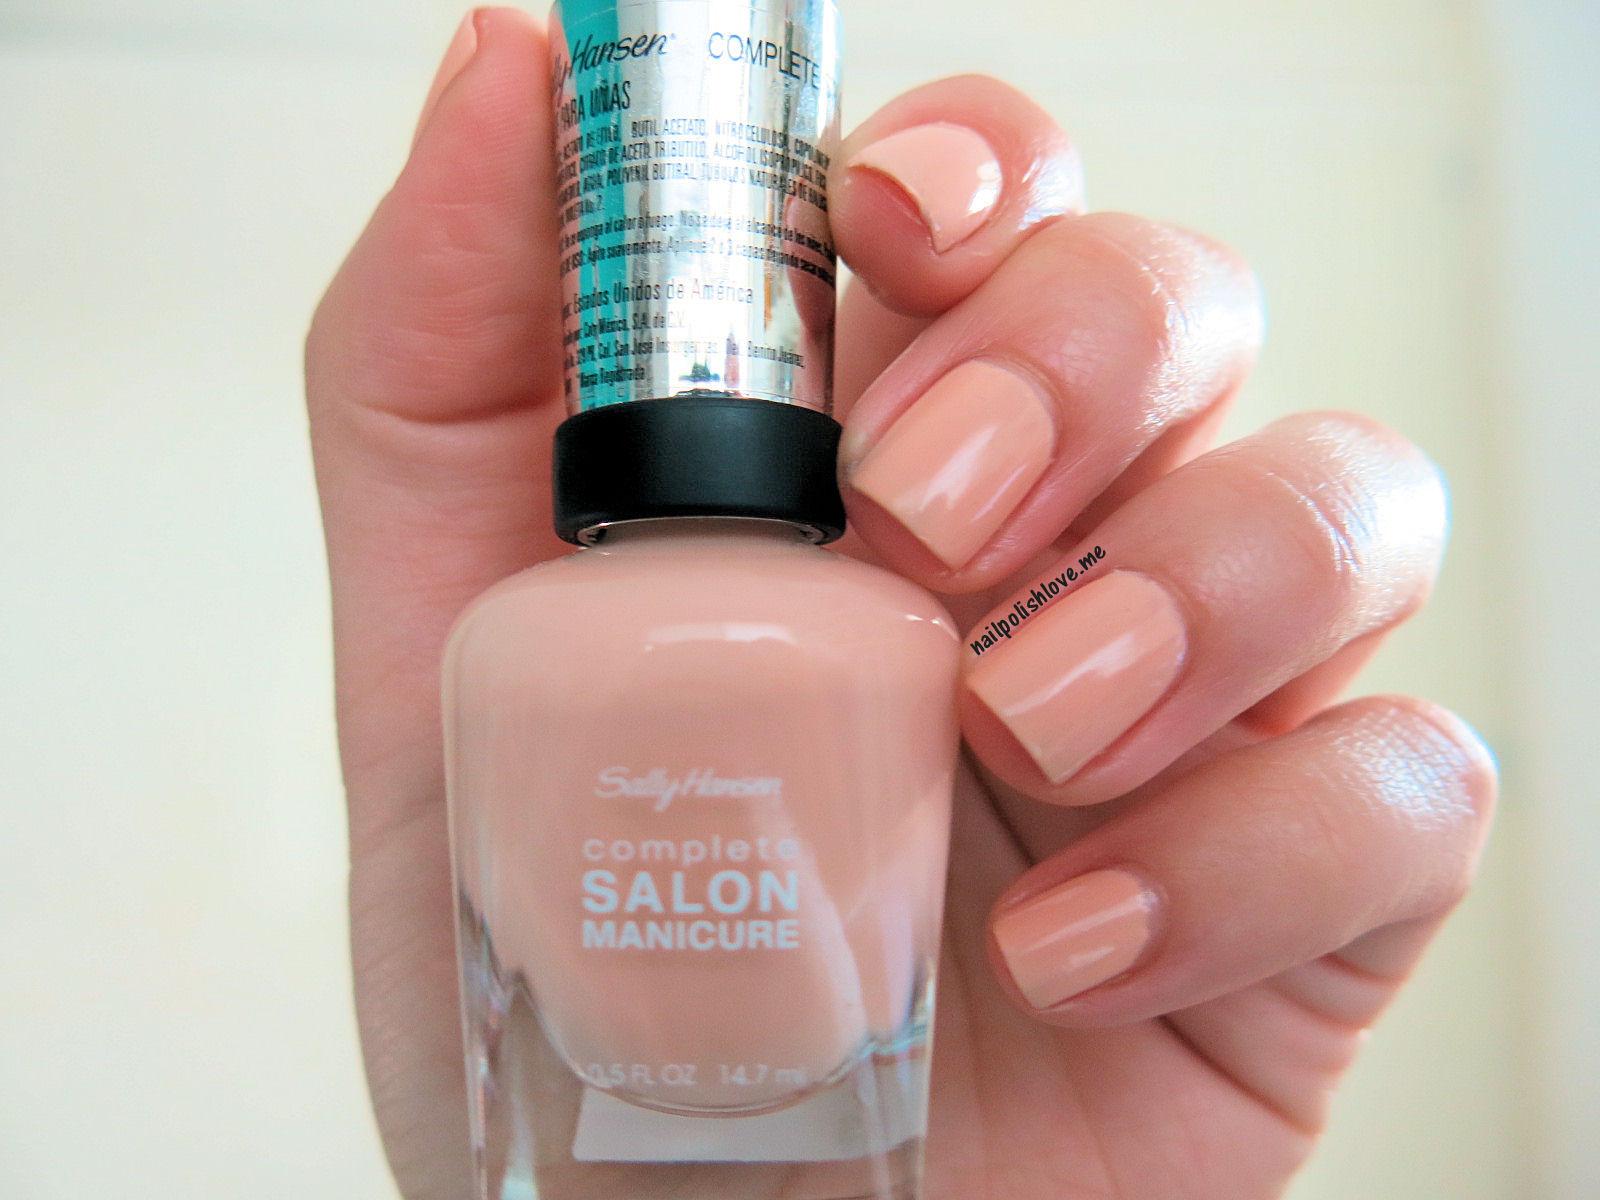 Colores: Royal Blush de Sally Hansen | Adrix Nails: Uñas, barnices ...